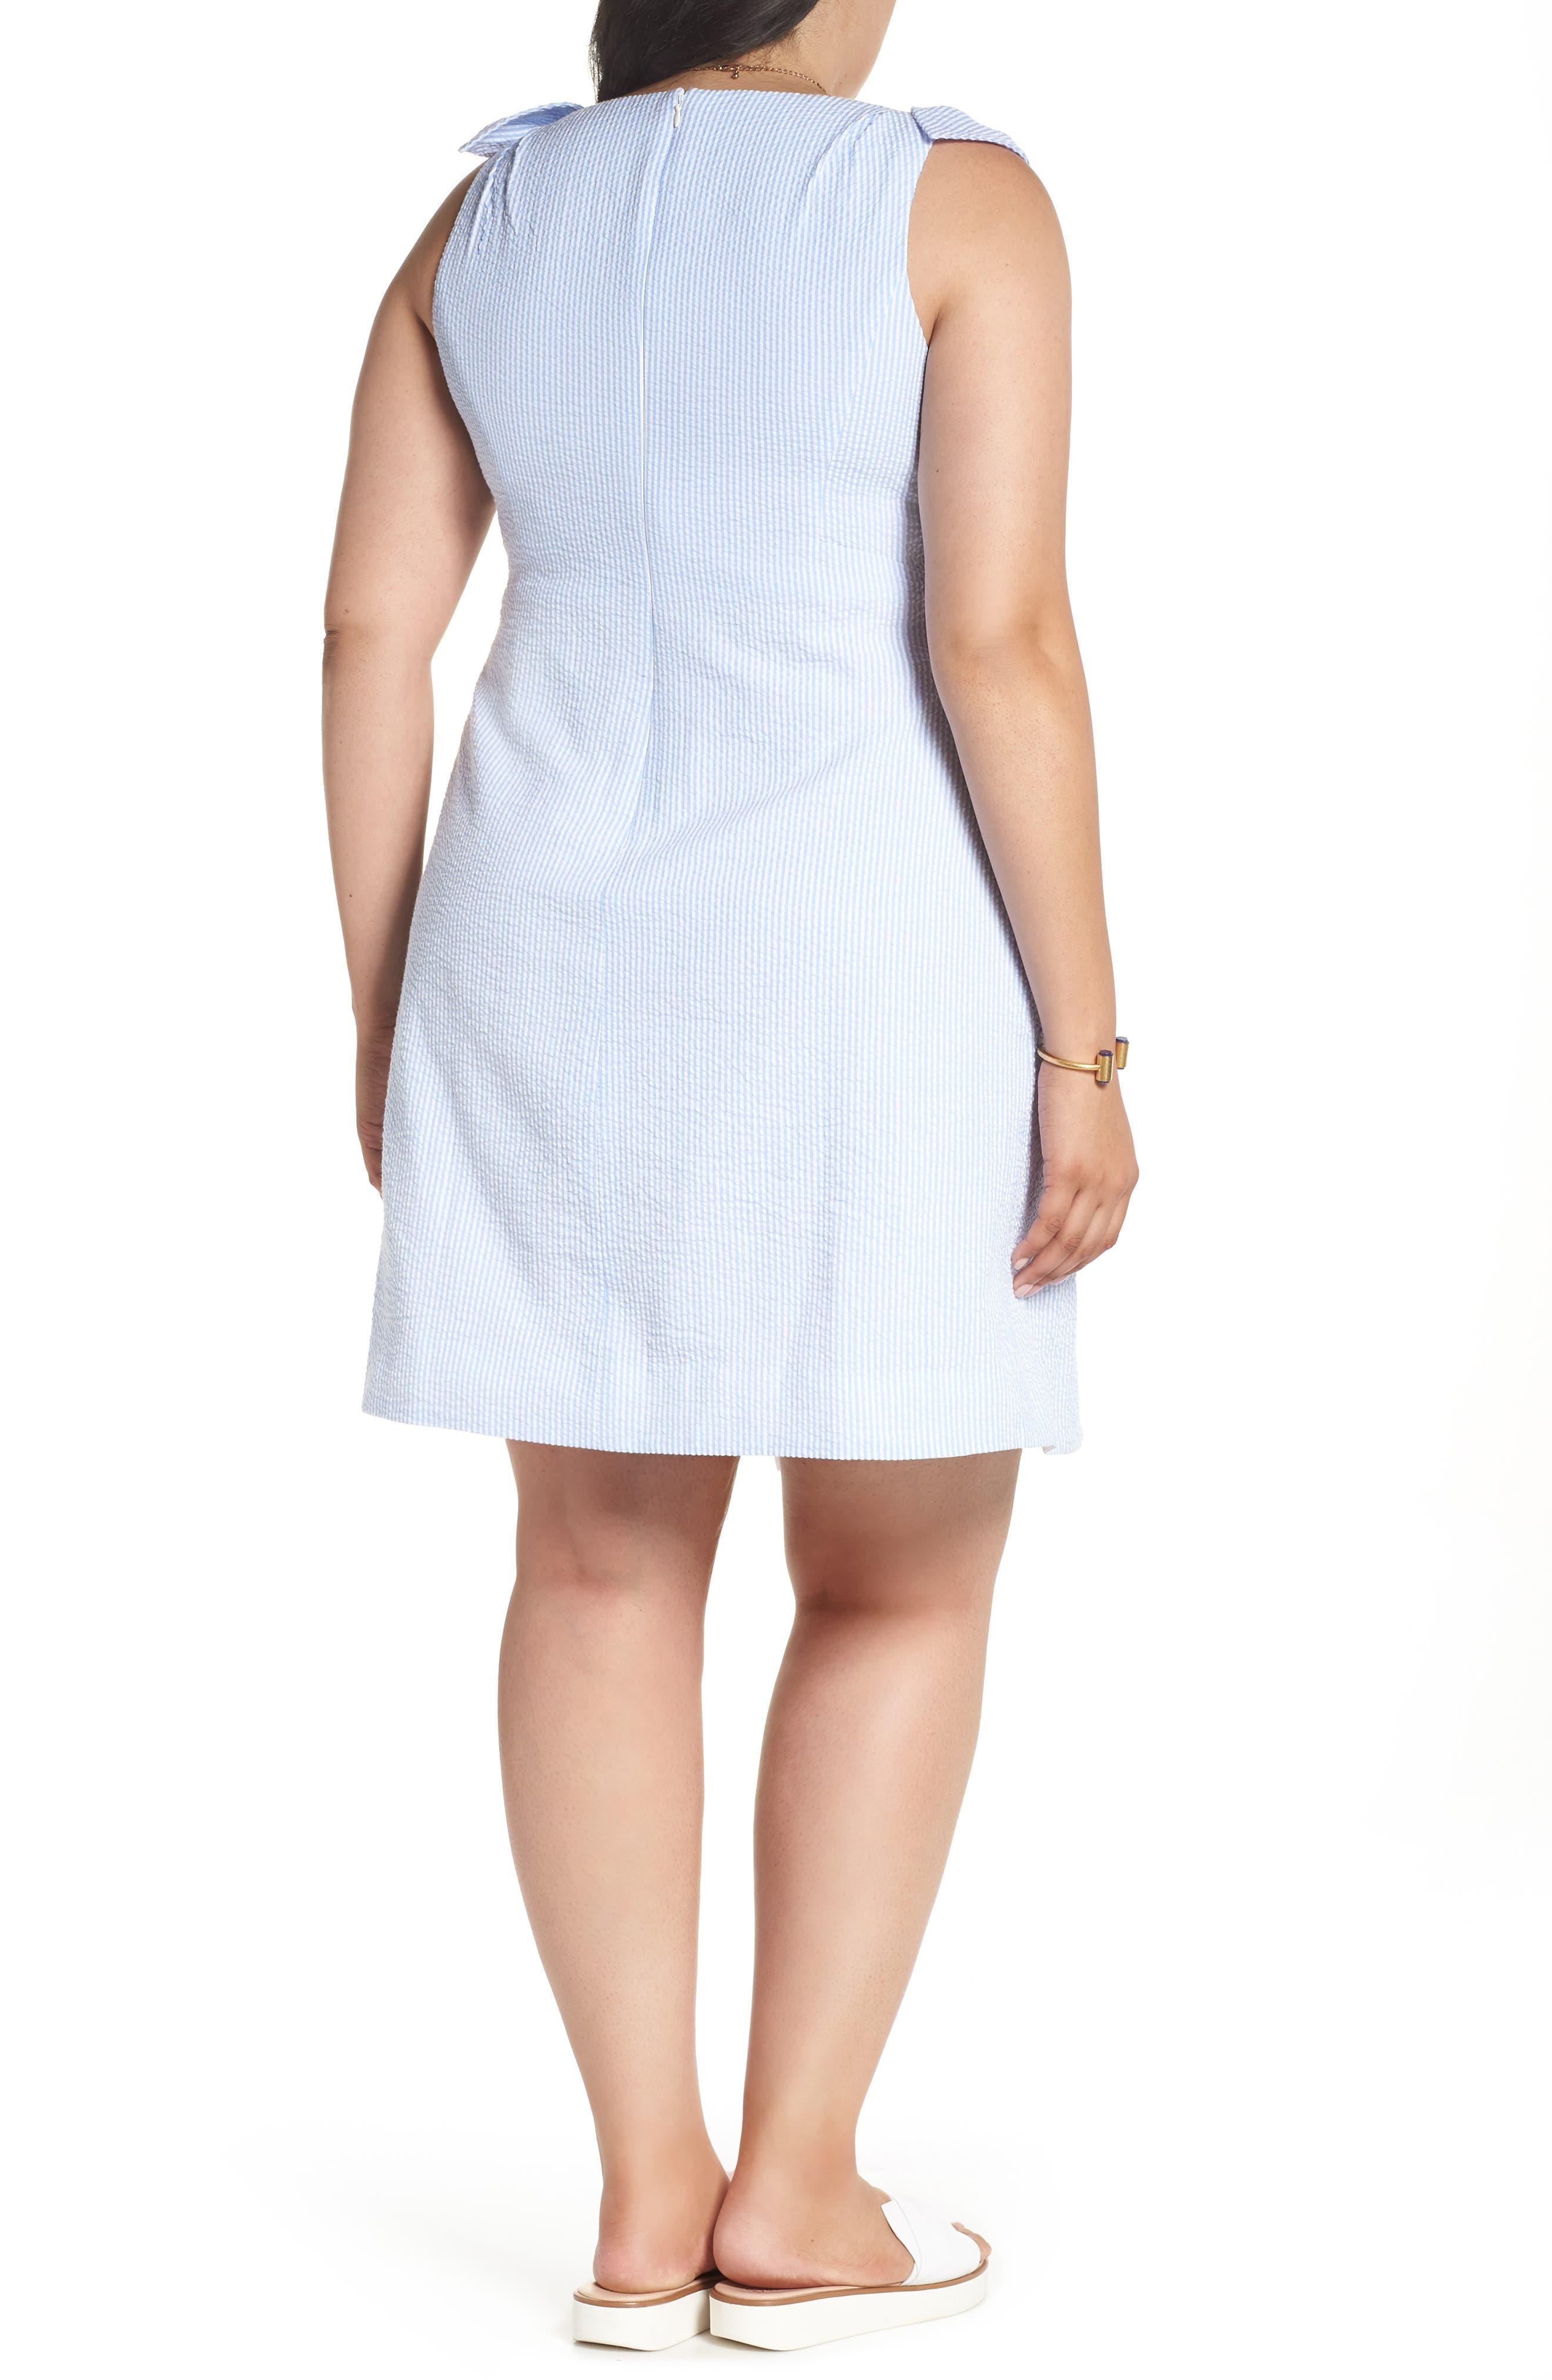 Bow Shoulder Seersucker Dress,                             Alternate thumbnail 3, color,                             Blue Seersucker Stripe